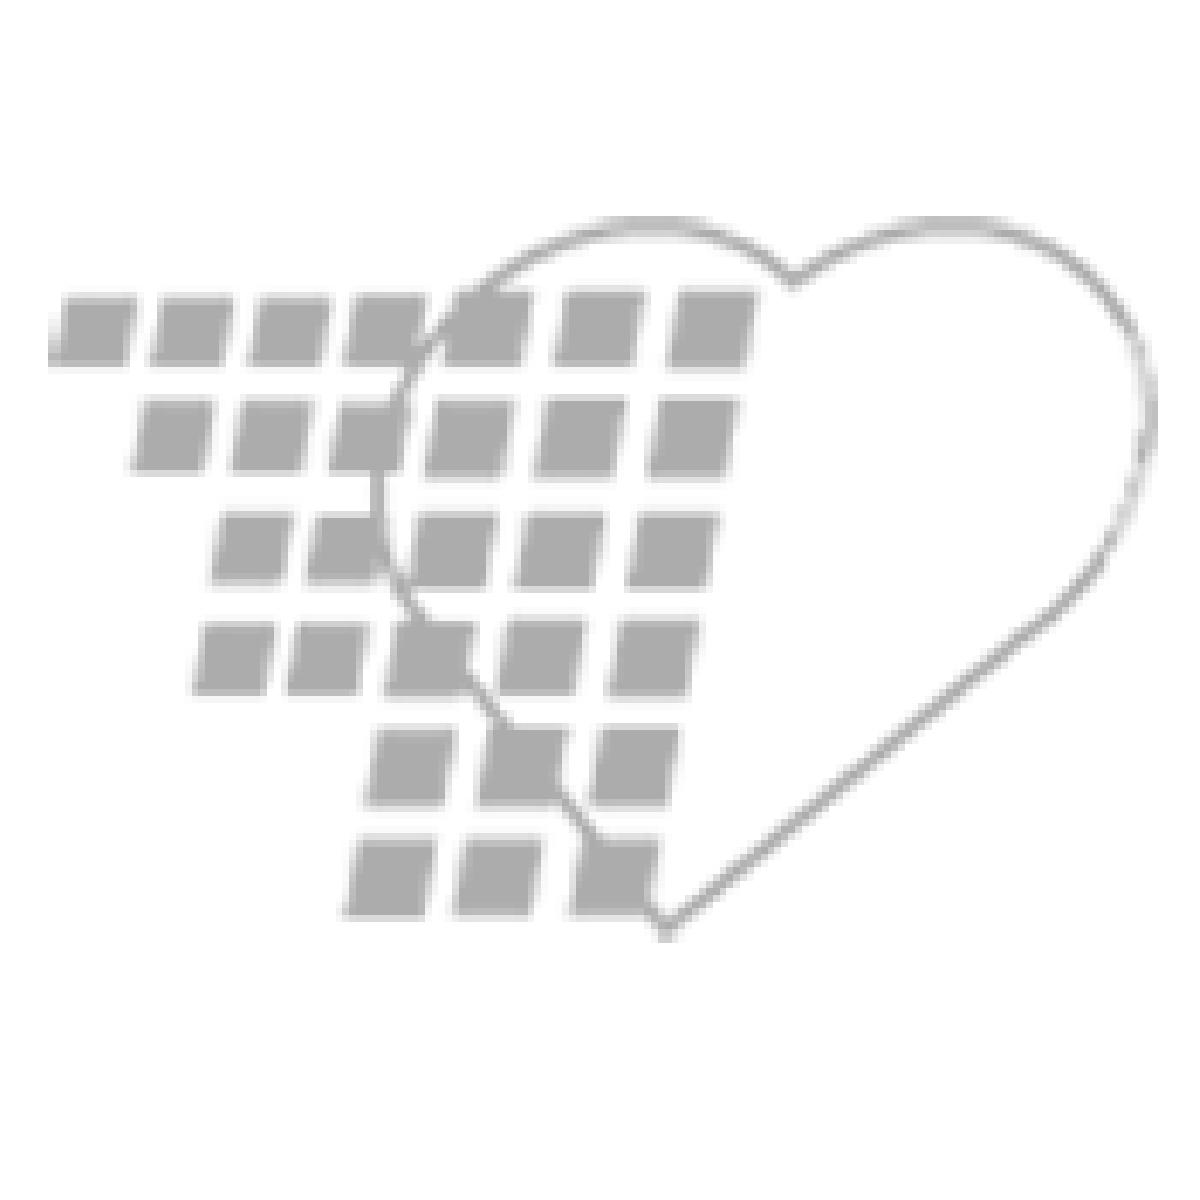 10-81-6125 SONOtrain Breast Model with Tumors